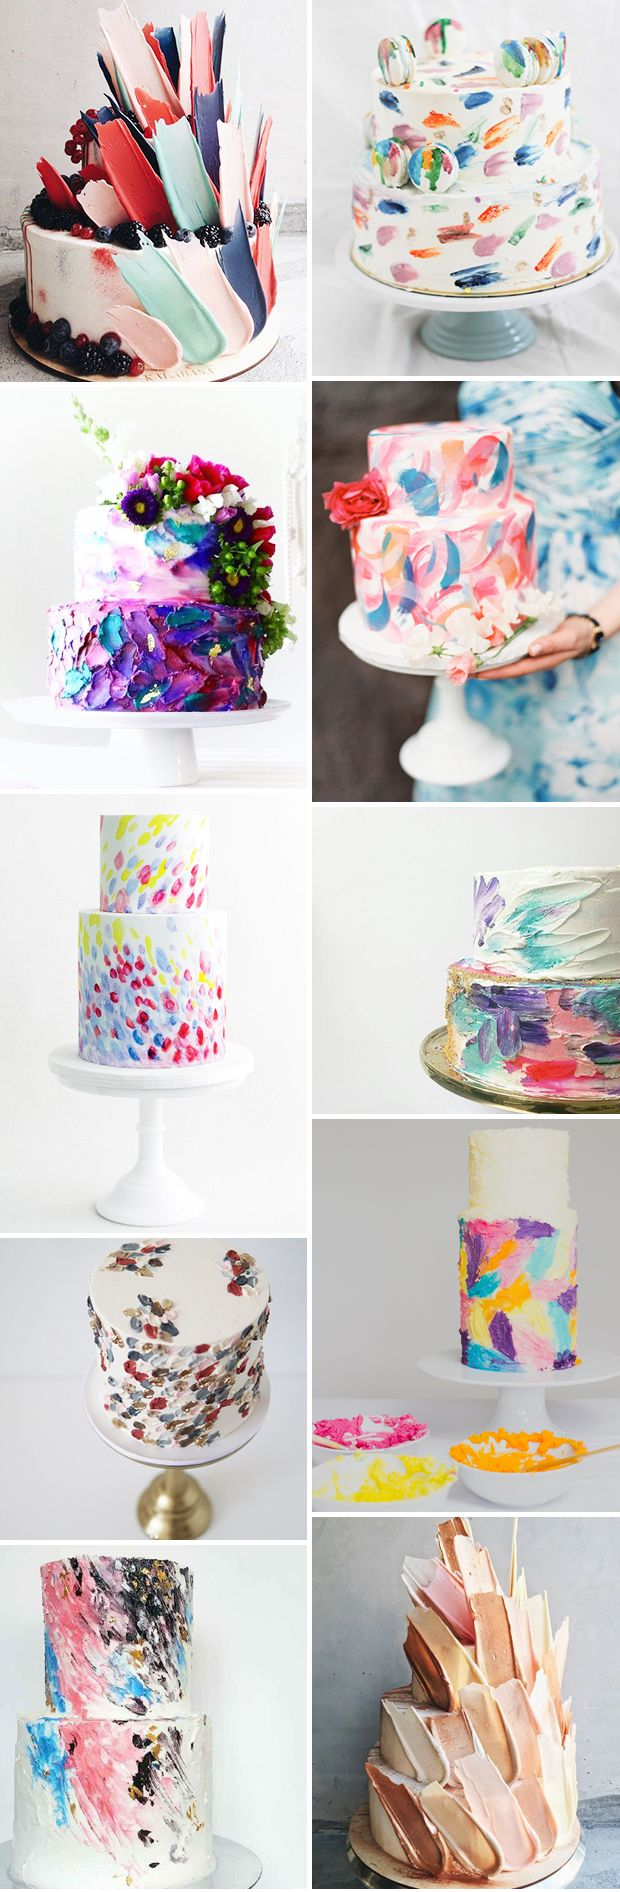 Brushstroke Cakes - 12 Phenomenal Wedding Cake Works of Art ...